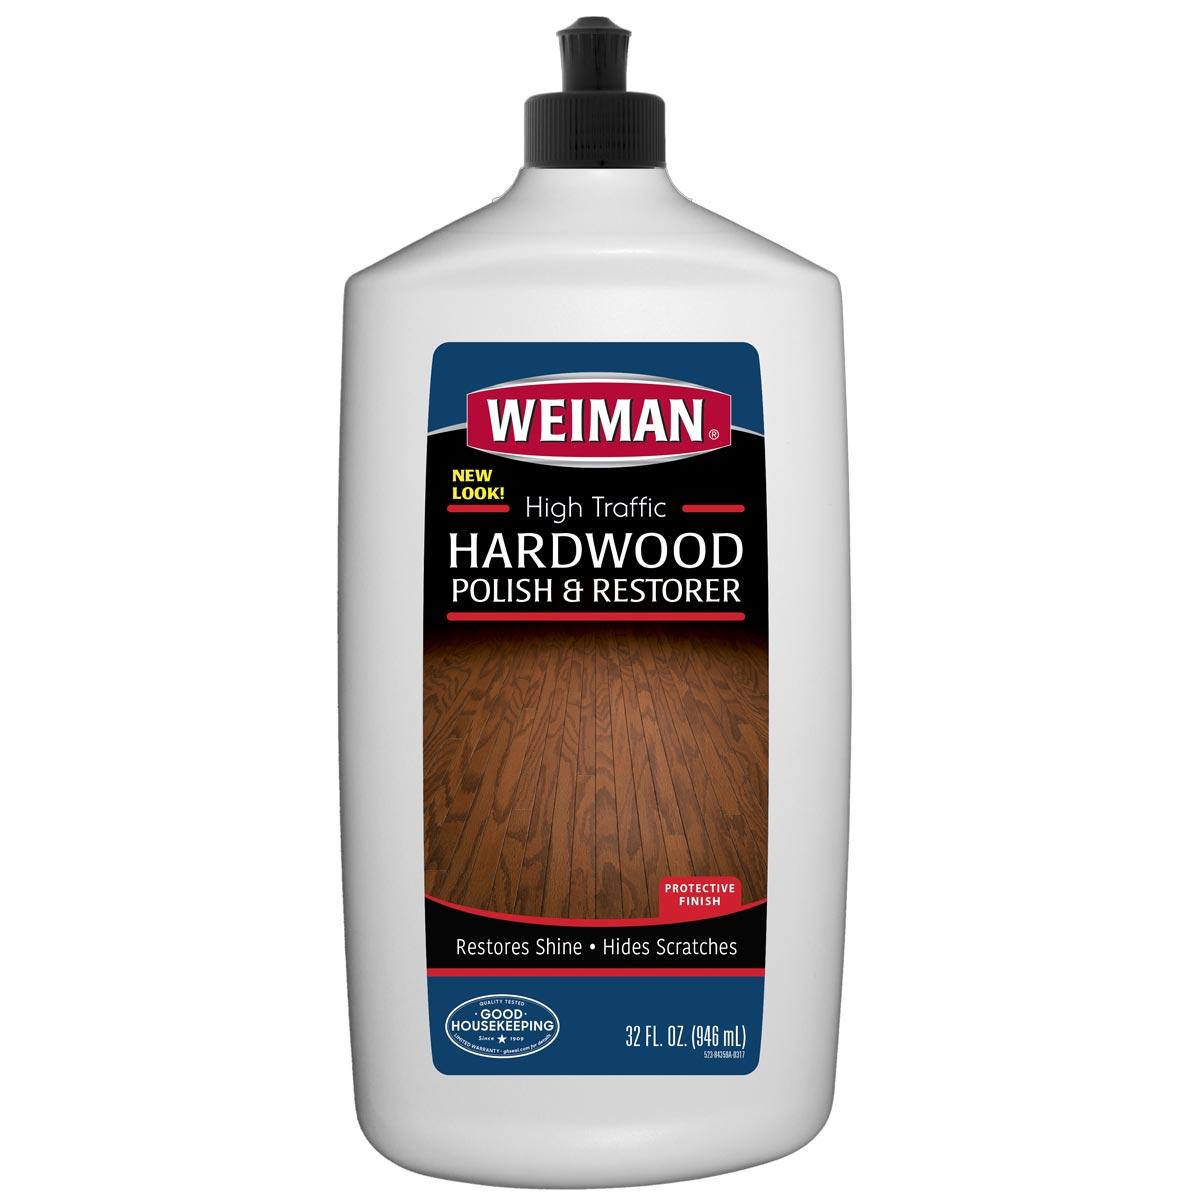 https://googone.com/media/catalog/product/h/a/hardwood-floor-polish-_-restorer_front_2.jpg